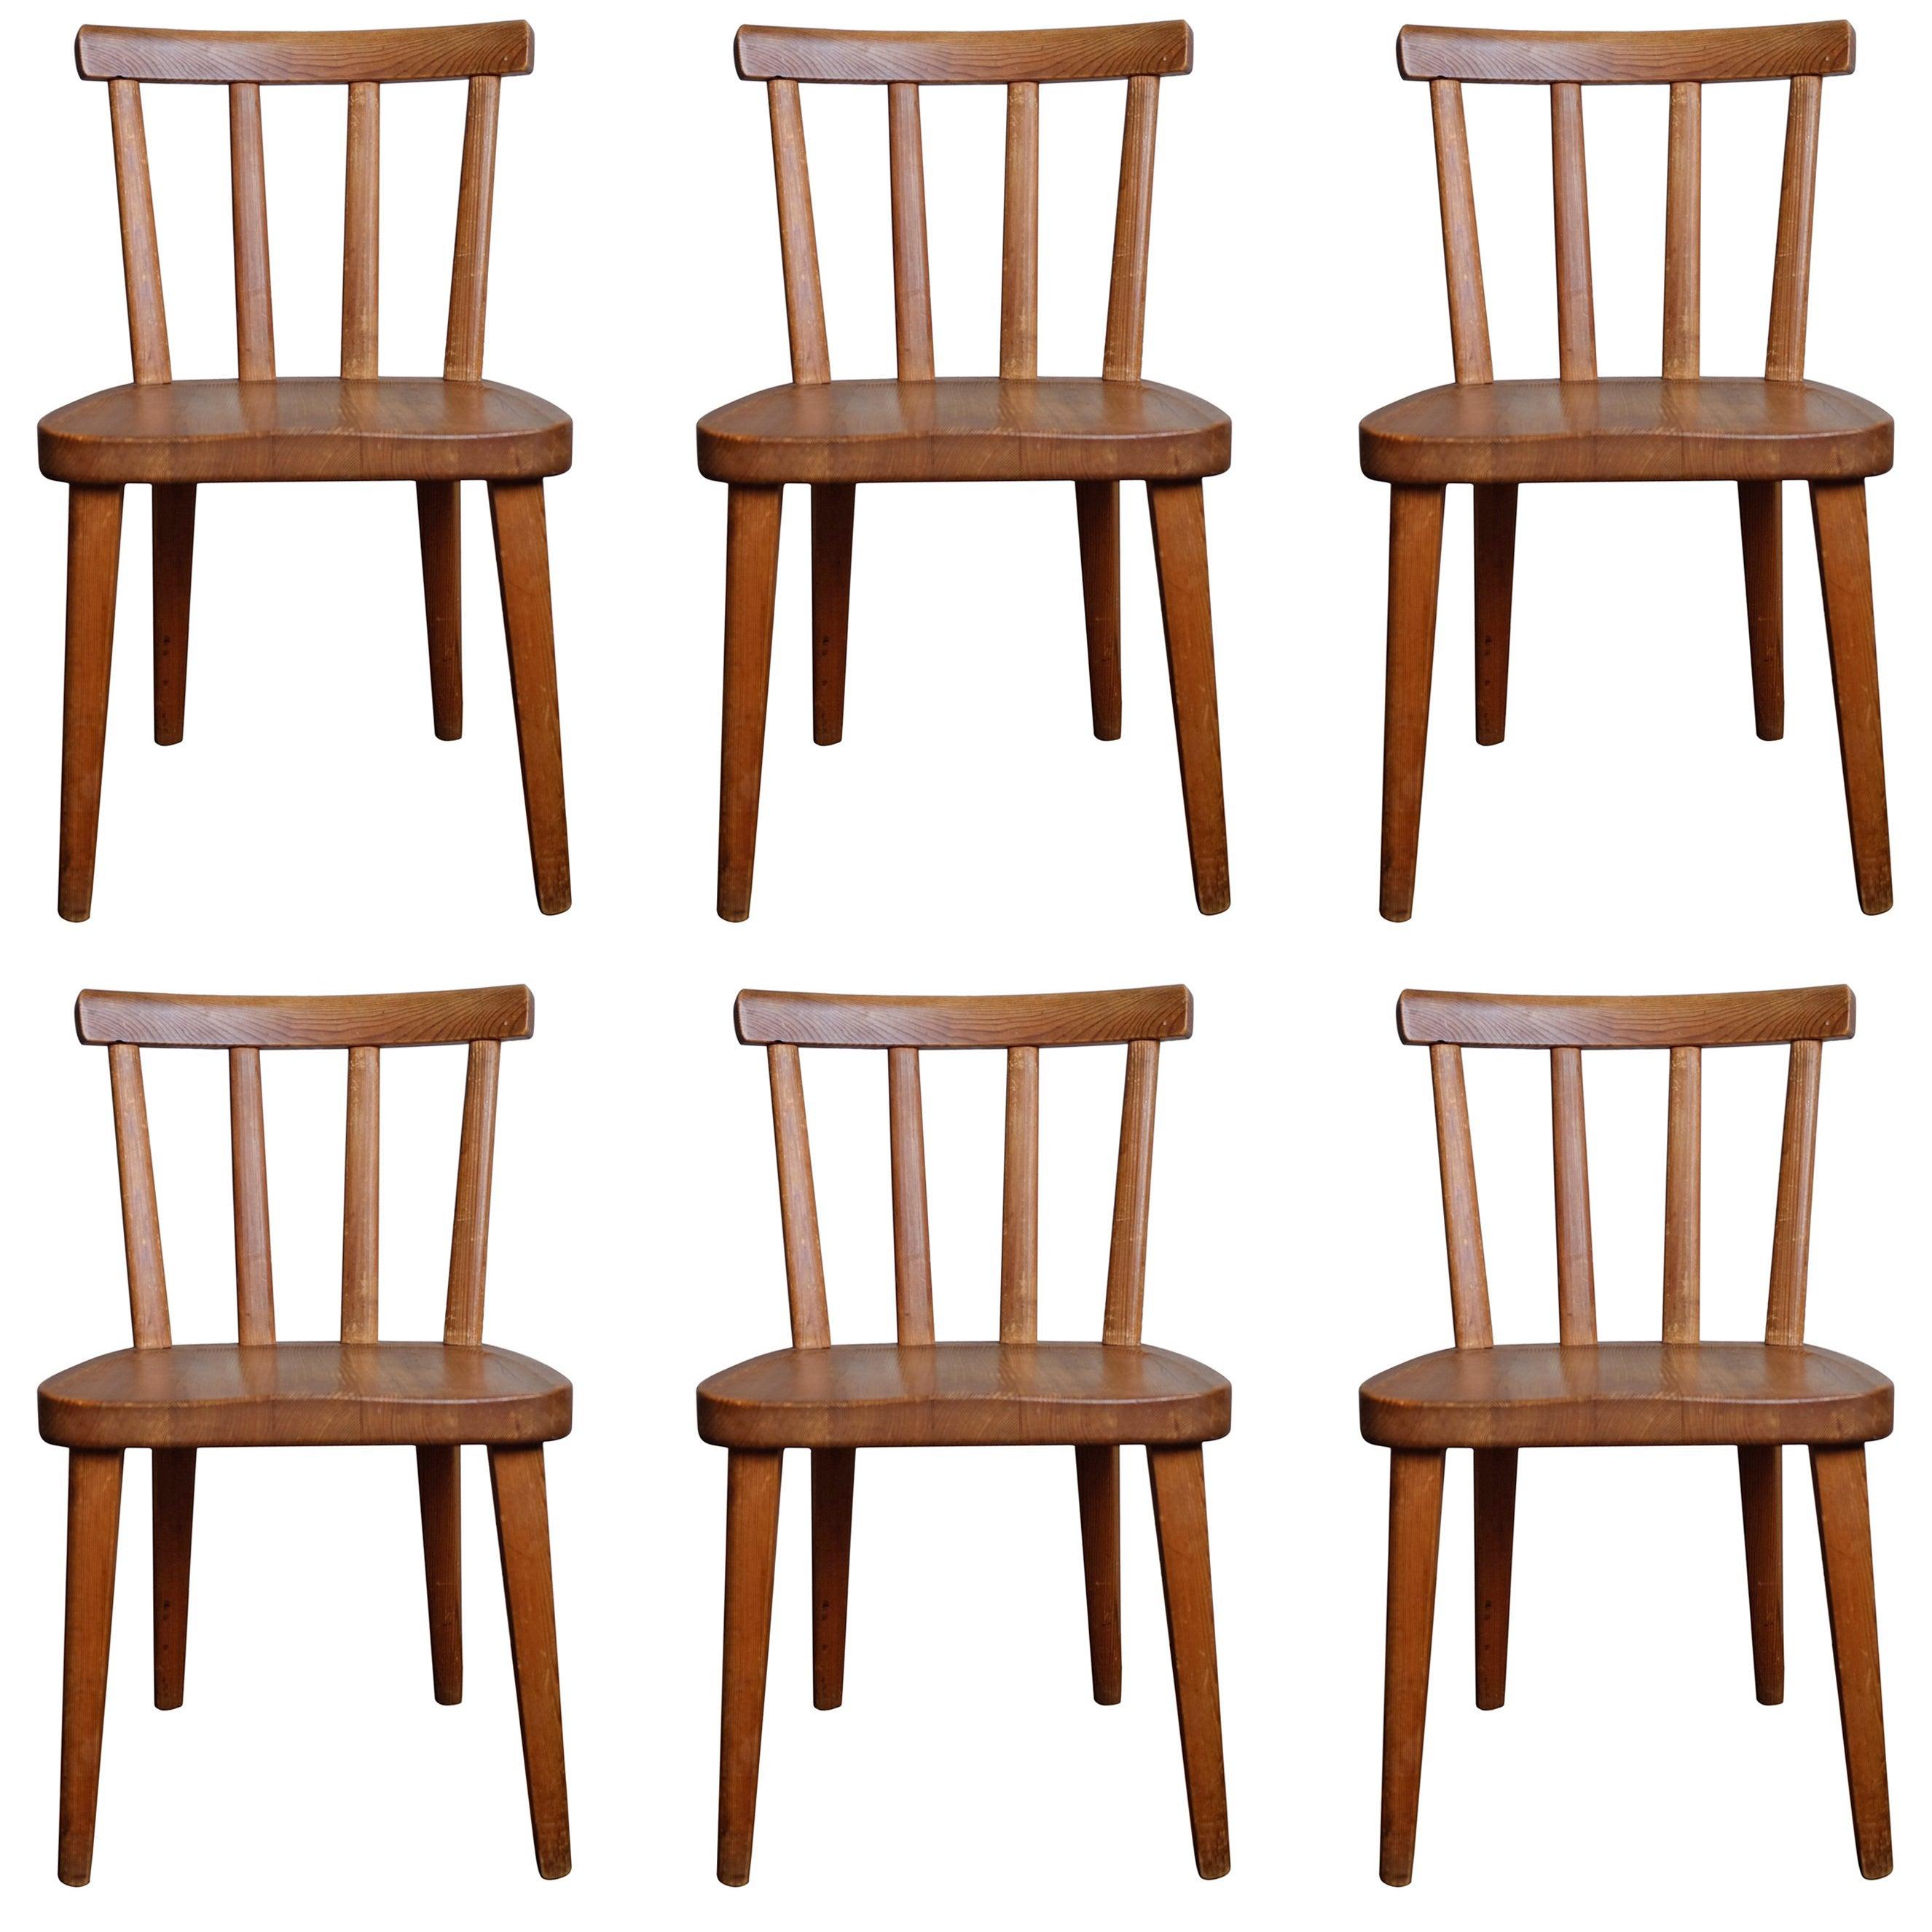 "Set of Six ""Utö"" Chairs by Axel Einar Hjorth, 1930s"